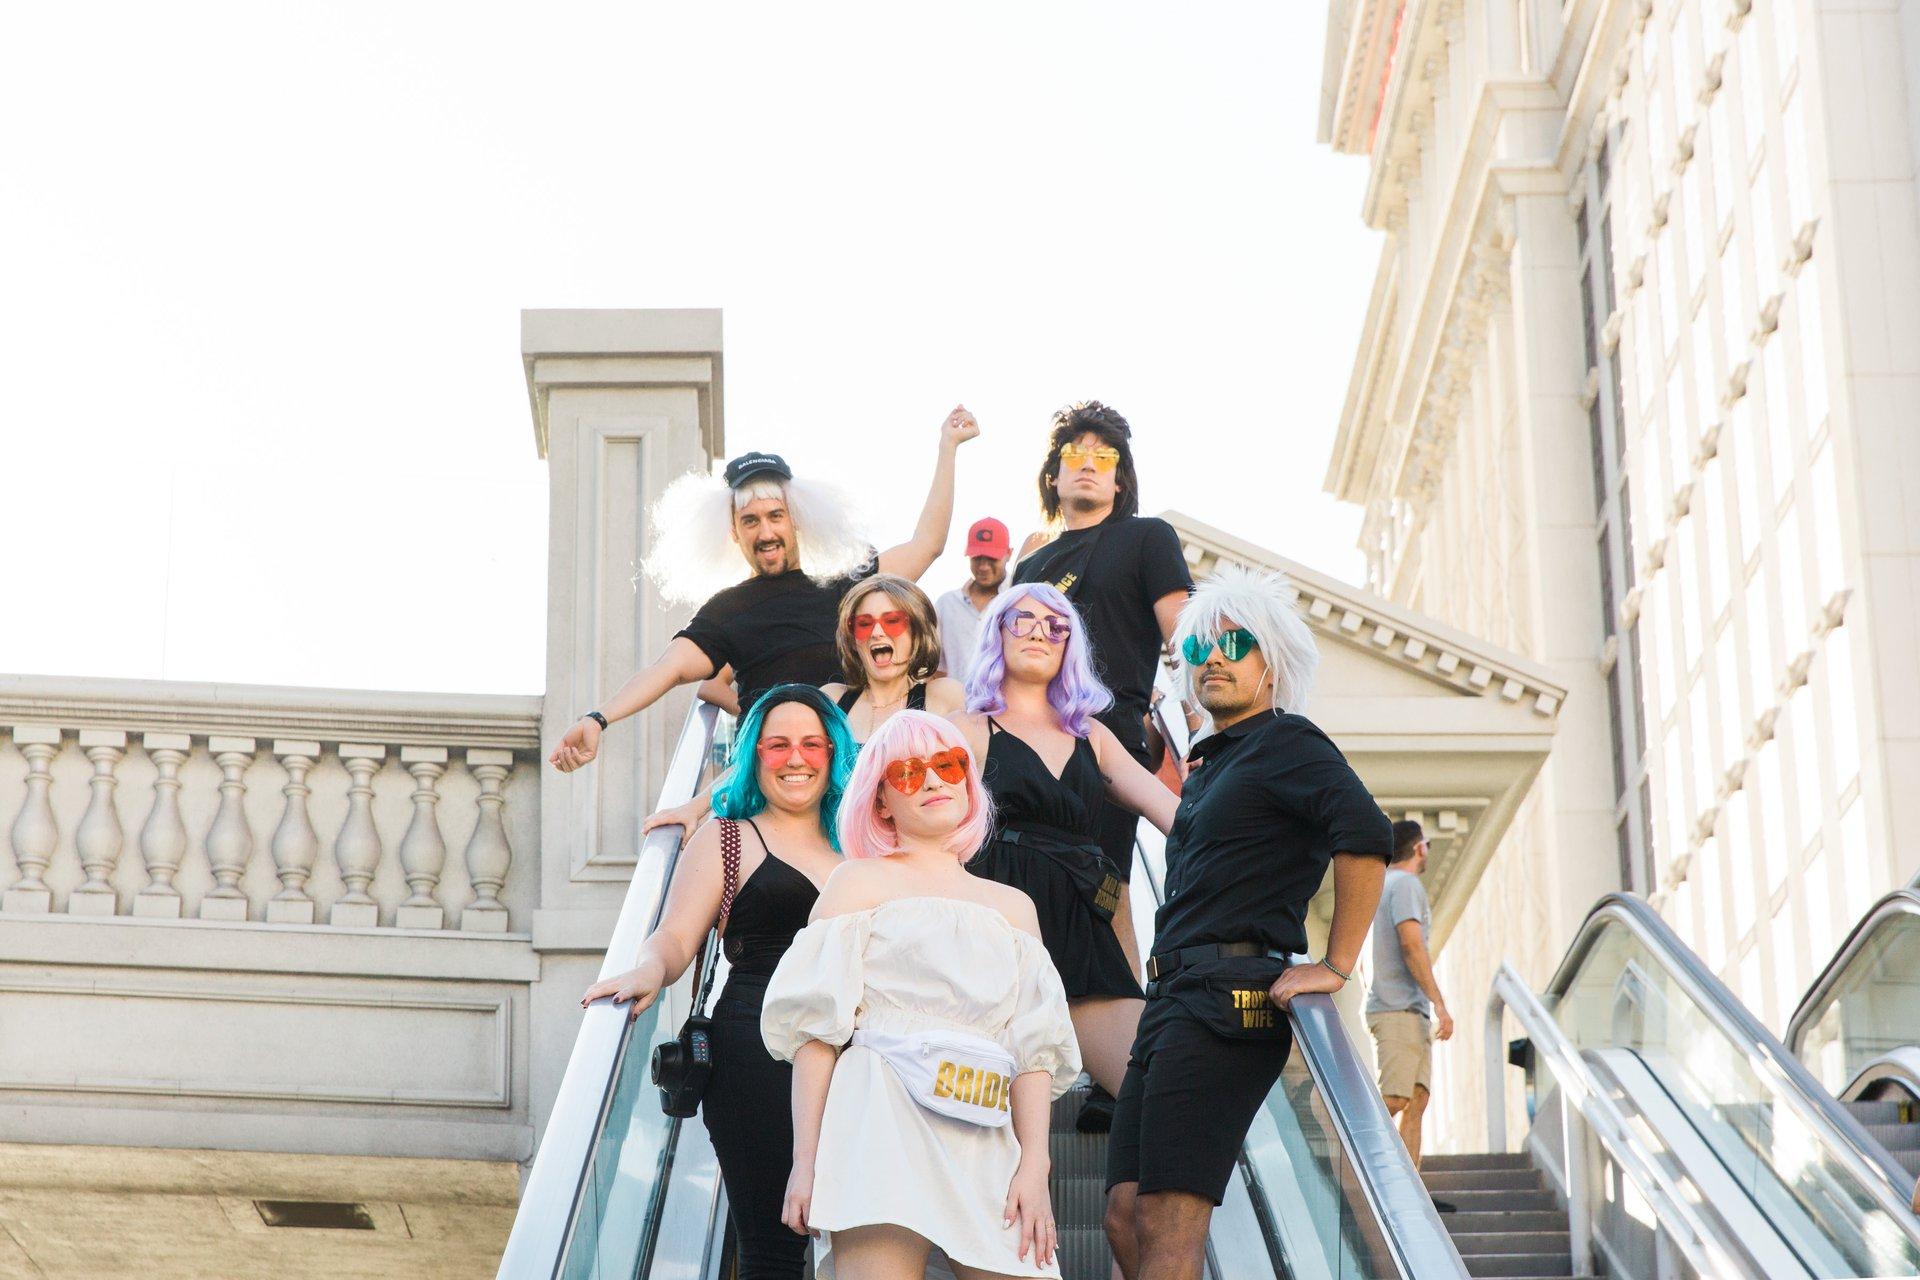 Flytographer Travel Story - Bachelorette Weekend in Vegas